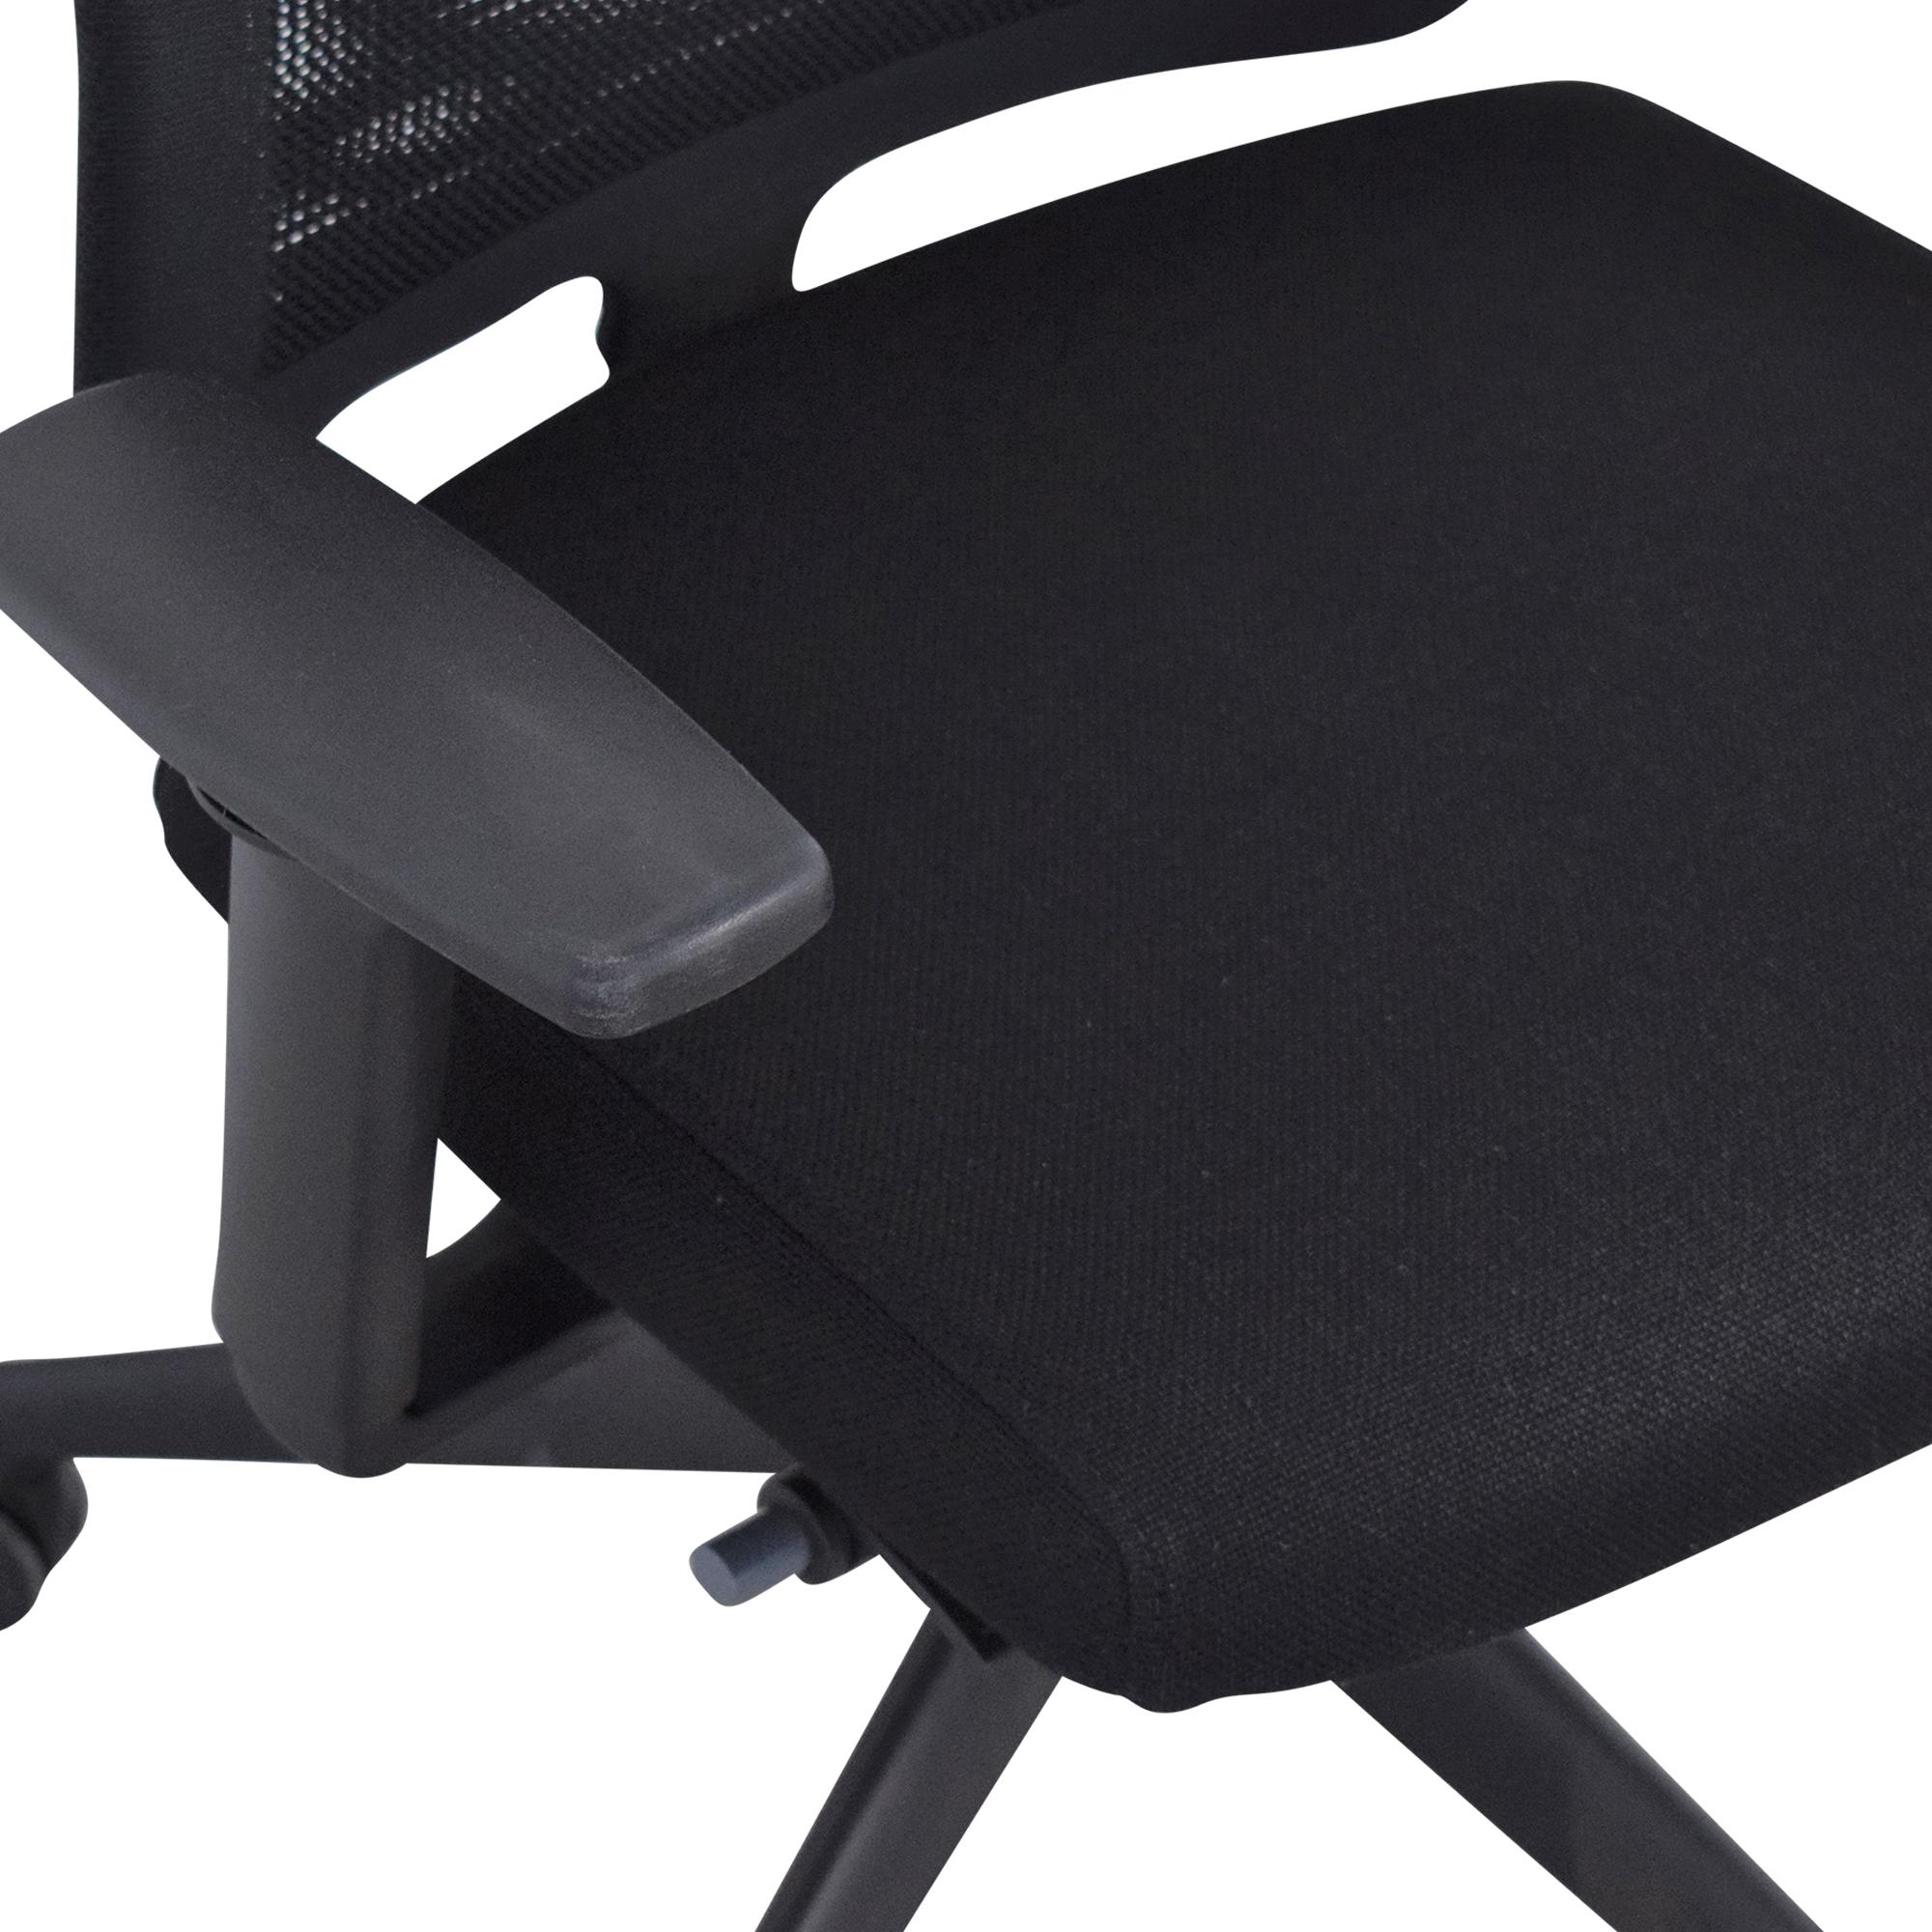 Koleksiyon Koleksiyon Dastan Operational Chair Home Office Chairs